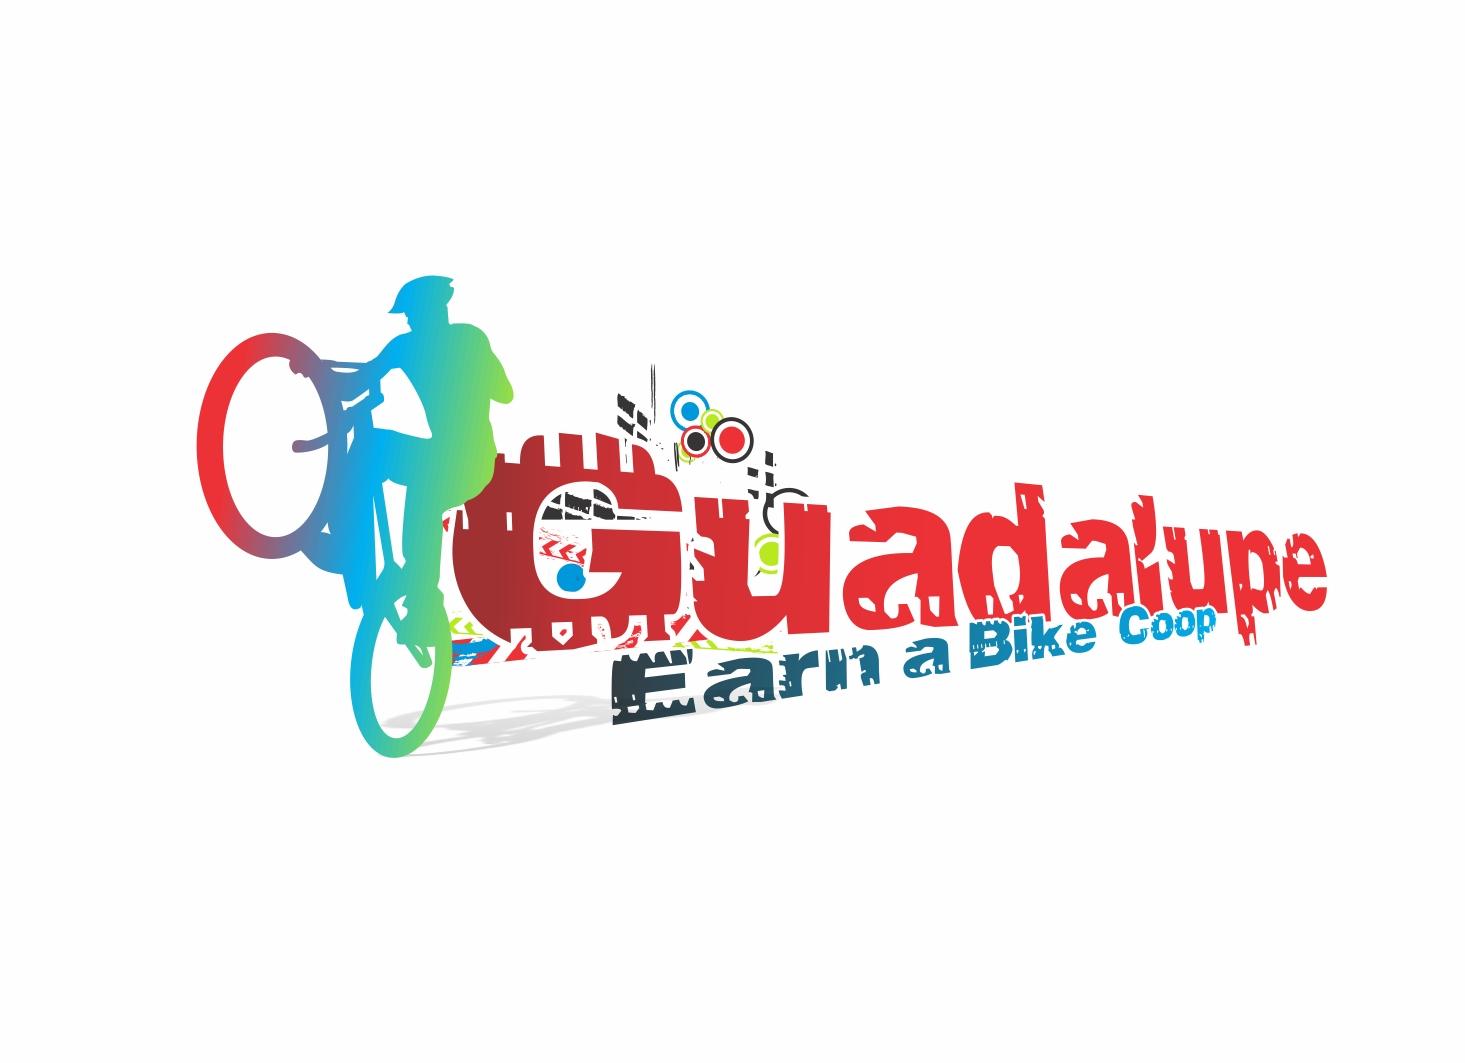 Logo Design by Zdravko Krulj - Entry No. 30 in the Logo Design Contest Inspiring Logo Design for Guadalupe Earn a Bike Coop..